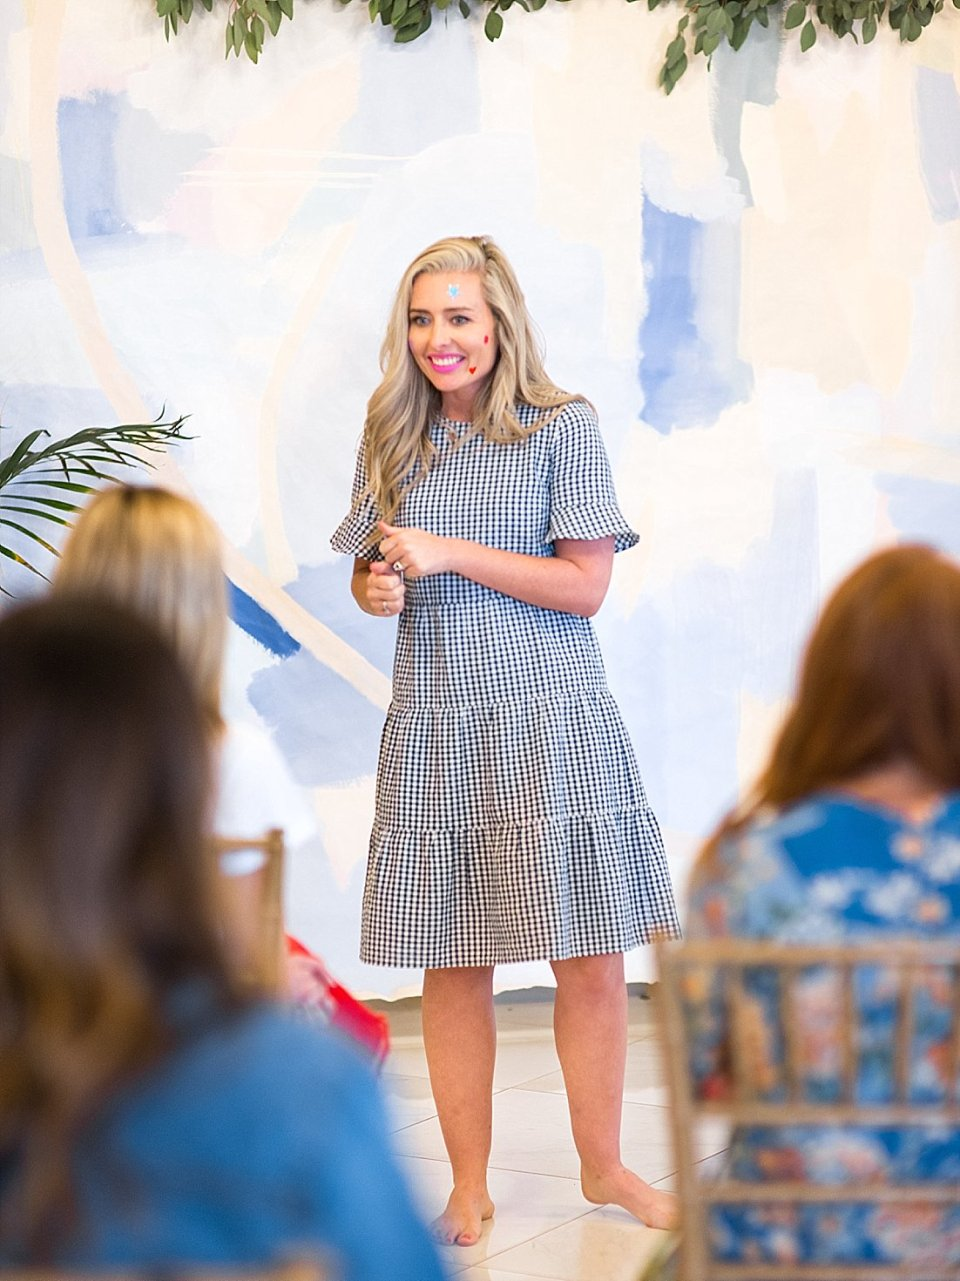 The Joyful Influencer retreat at the kentucky castle Instagram influencer event Ashley Lemieux speaking